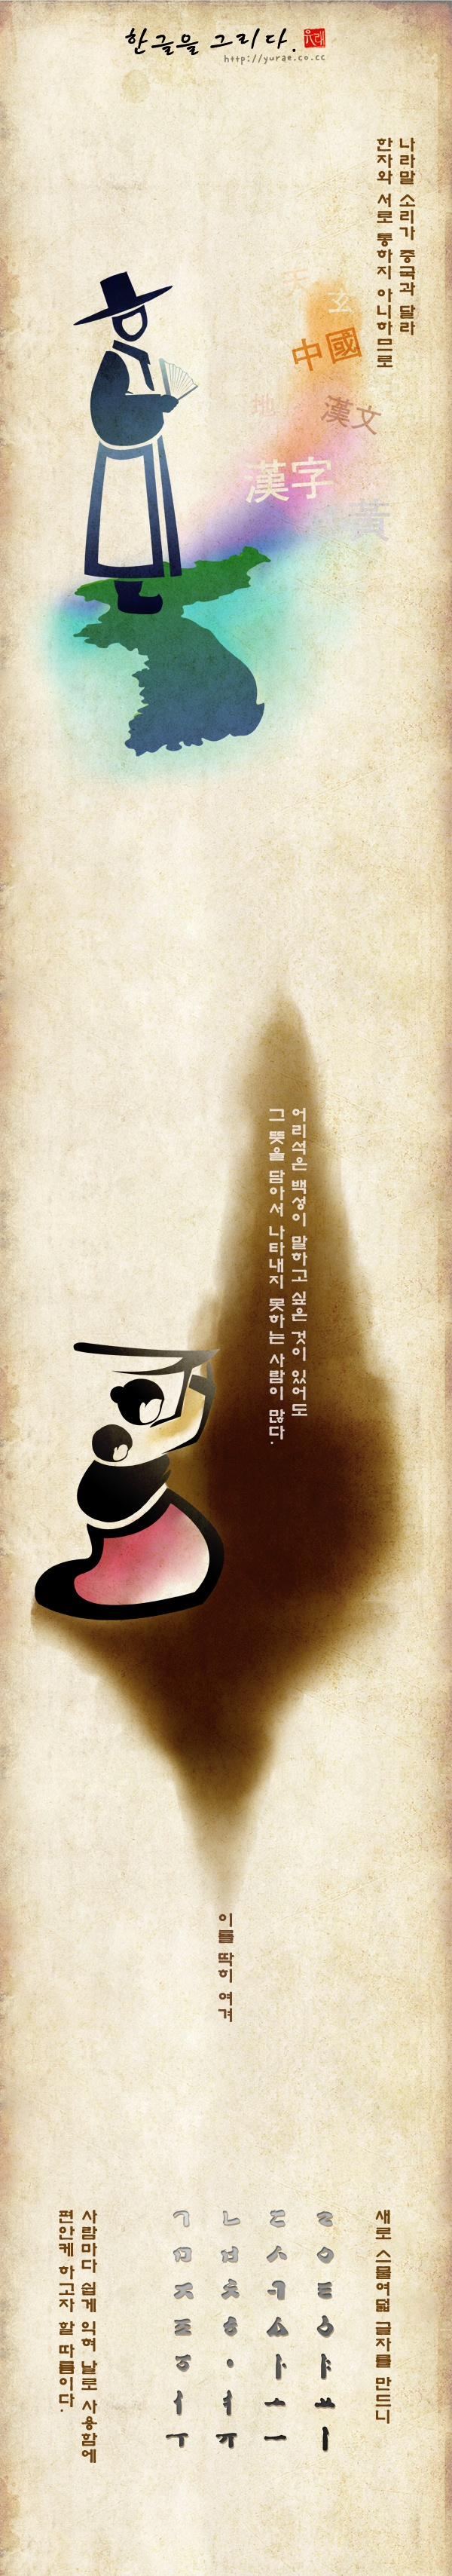 A Beatiful Hangul